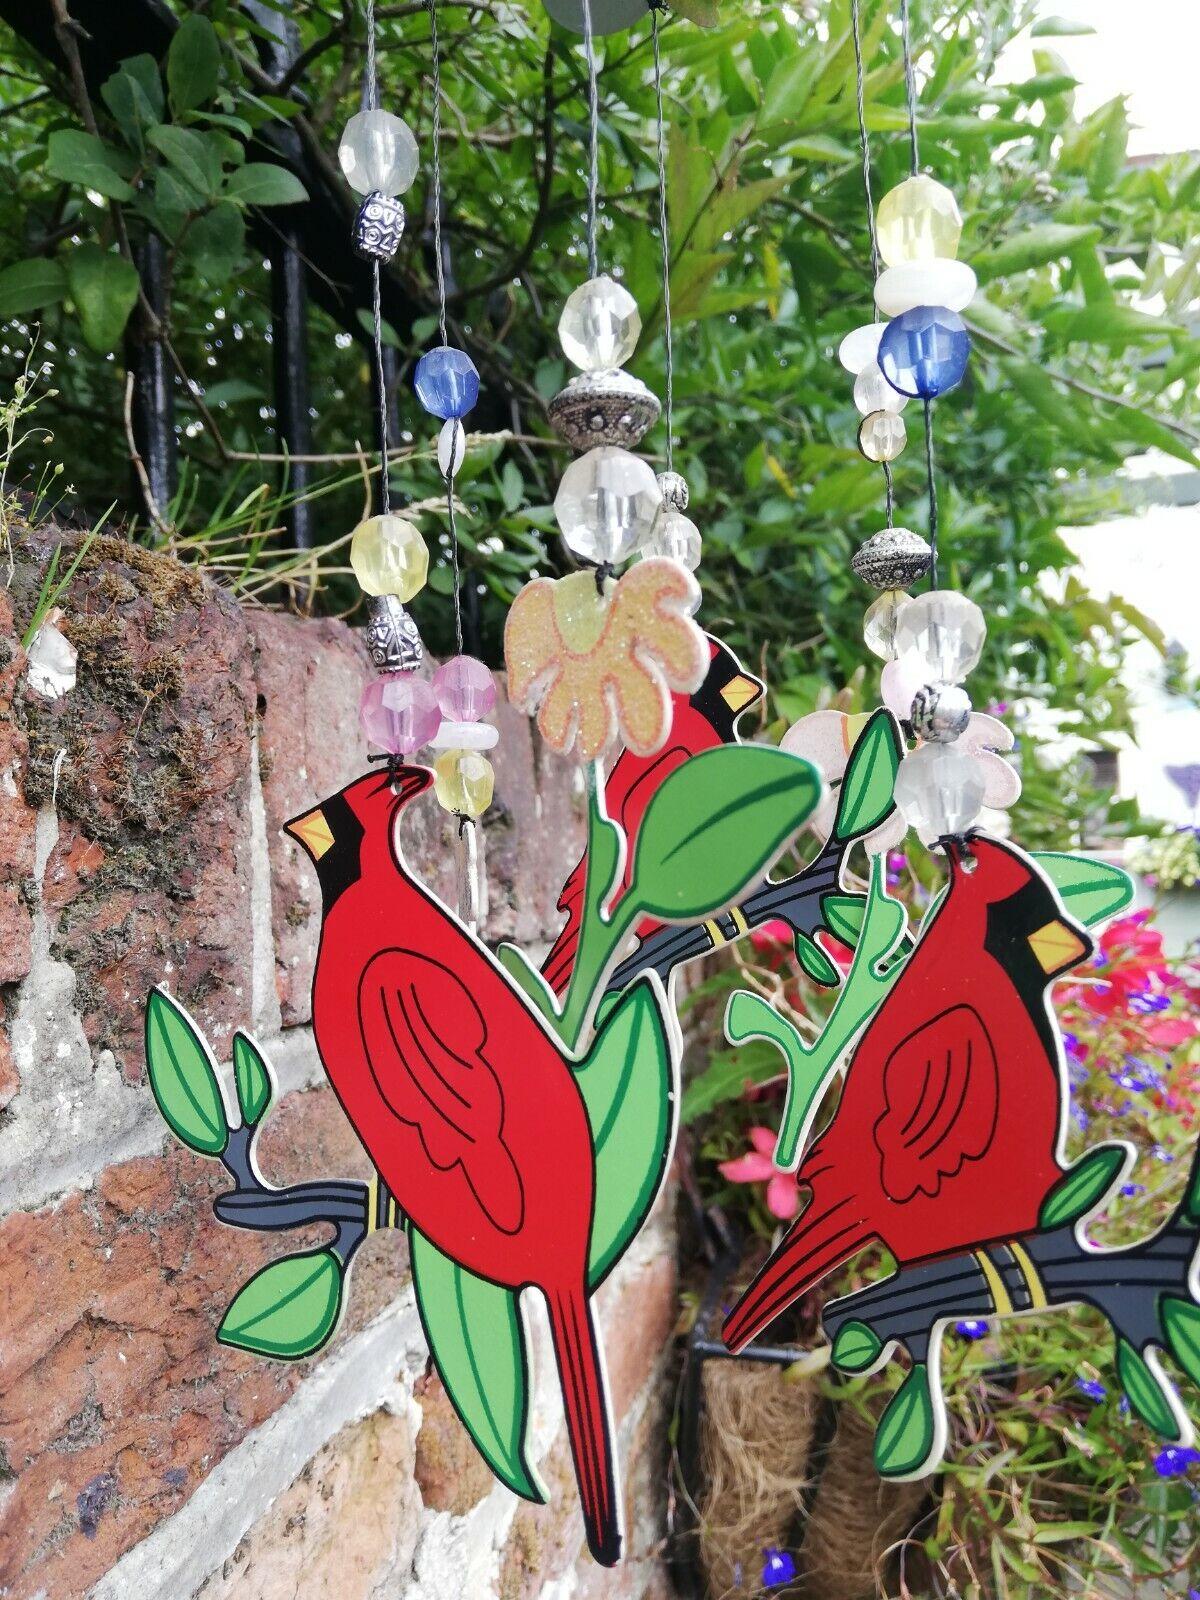 Red Cardinal Bird & Flowers Wind Chimes.